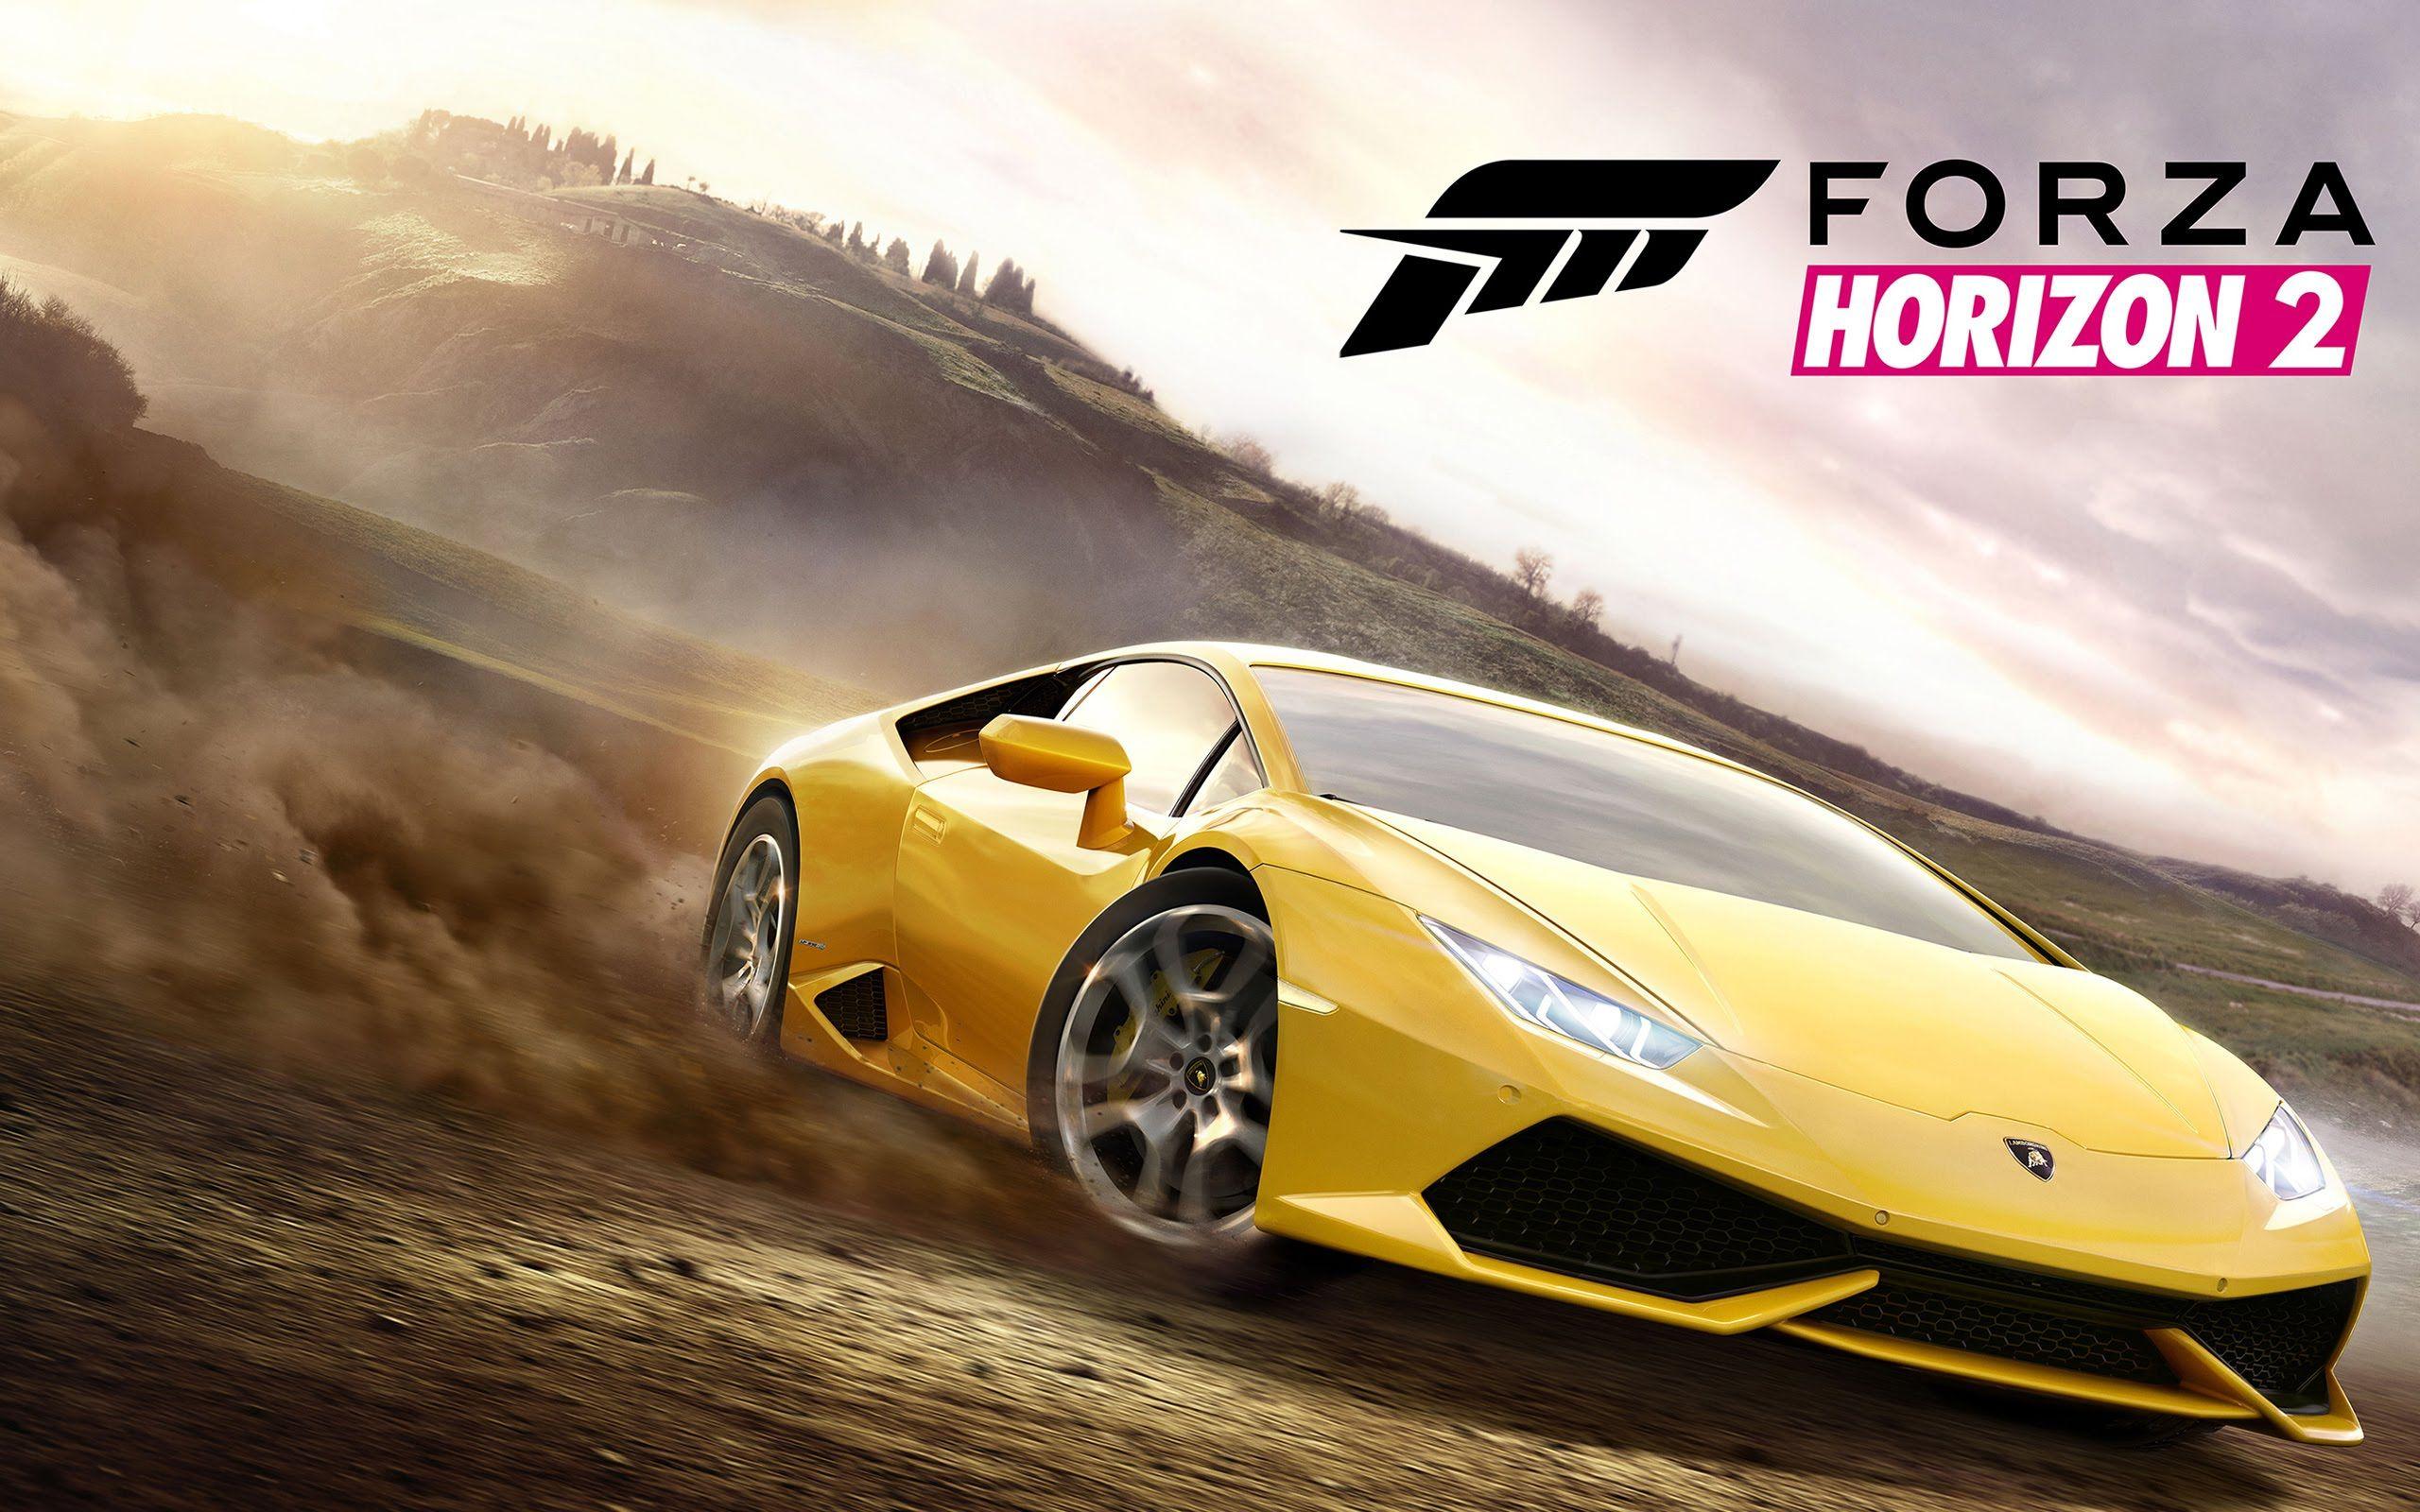 forza horizon 2 download free pc full version windows 7